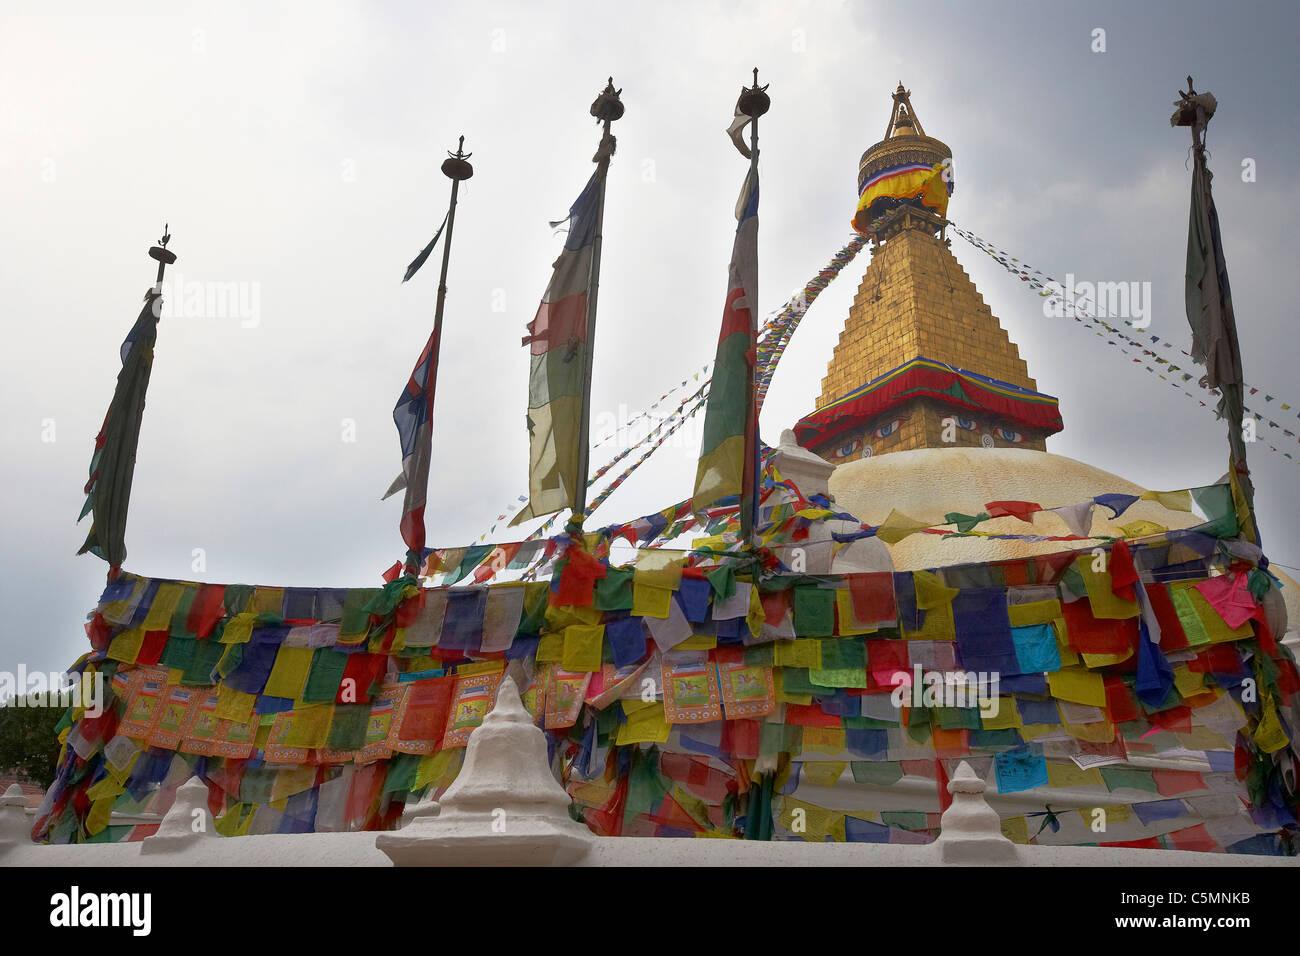 The eyes of the Buddha gaze out from the Boudhanath stupa, Bodhnath (Boudha), Kathmandu Valley, Nepal, Asia. - Stock Image